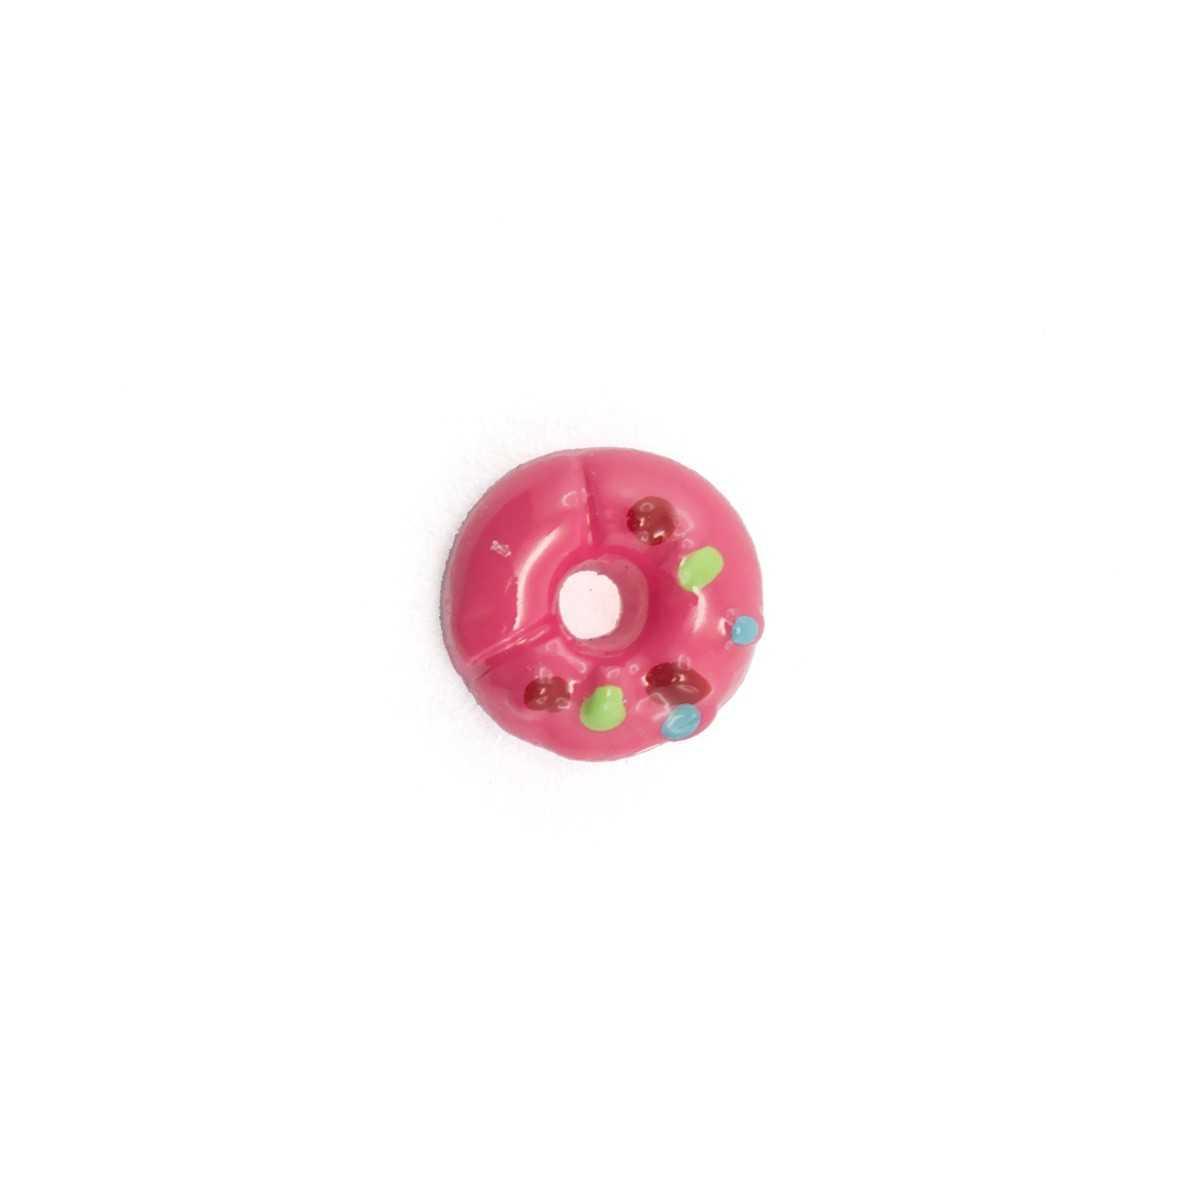 https://www.kit-manucure.com/1488-thickbox_default/bijoux-pour-ongles-donuts-rose-fushia.jpg